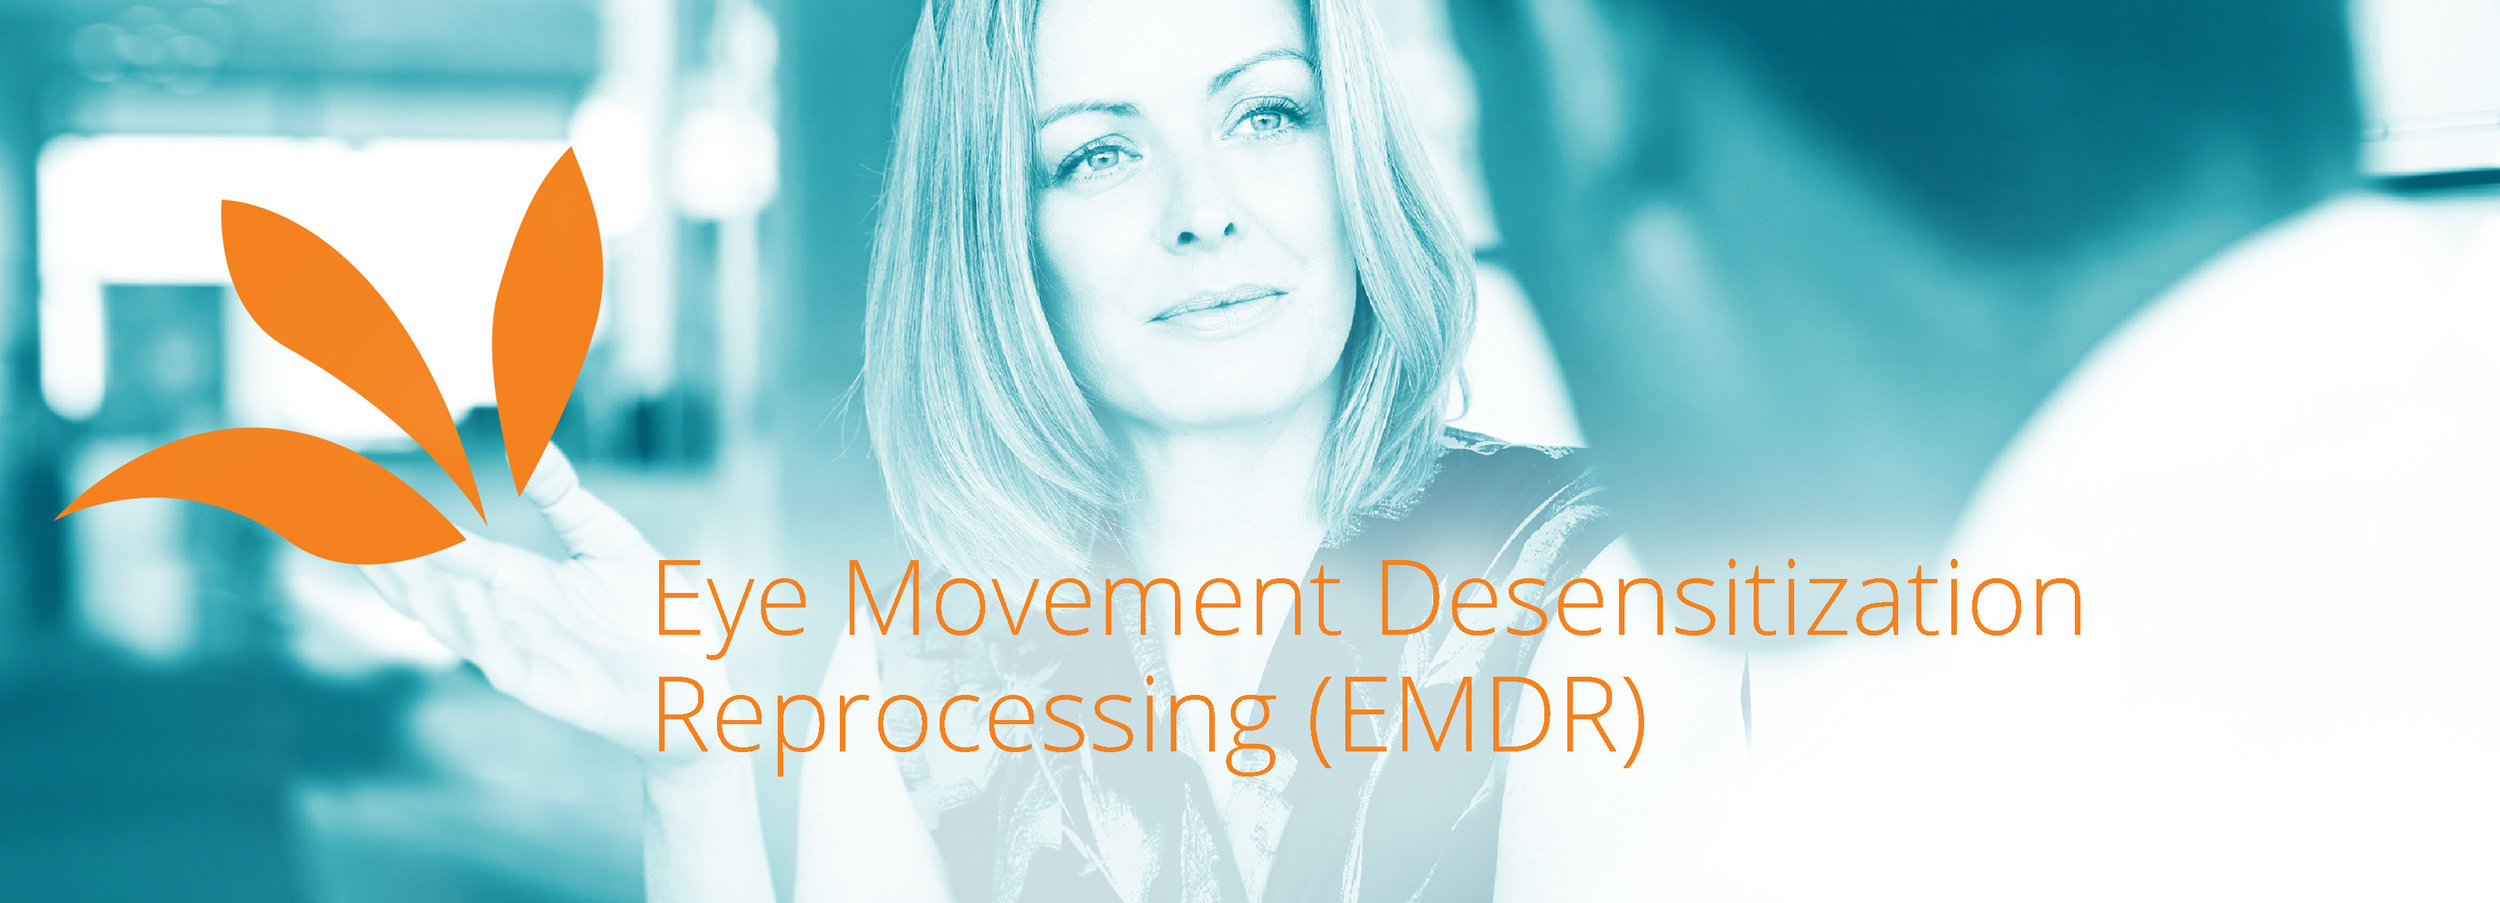 text_EMDR.jpg